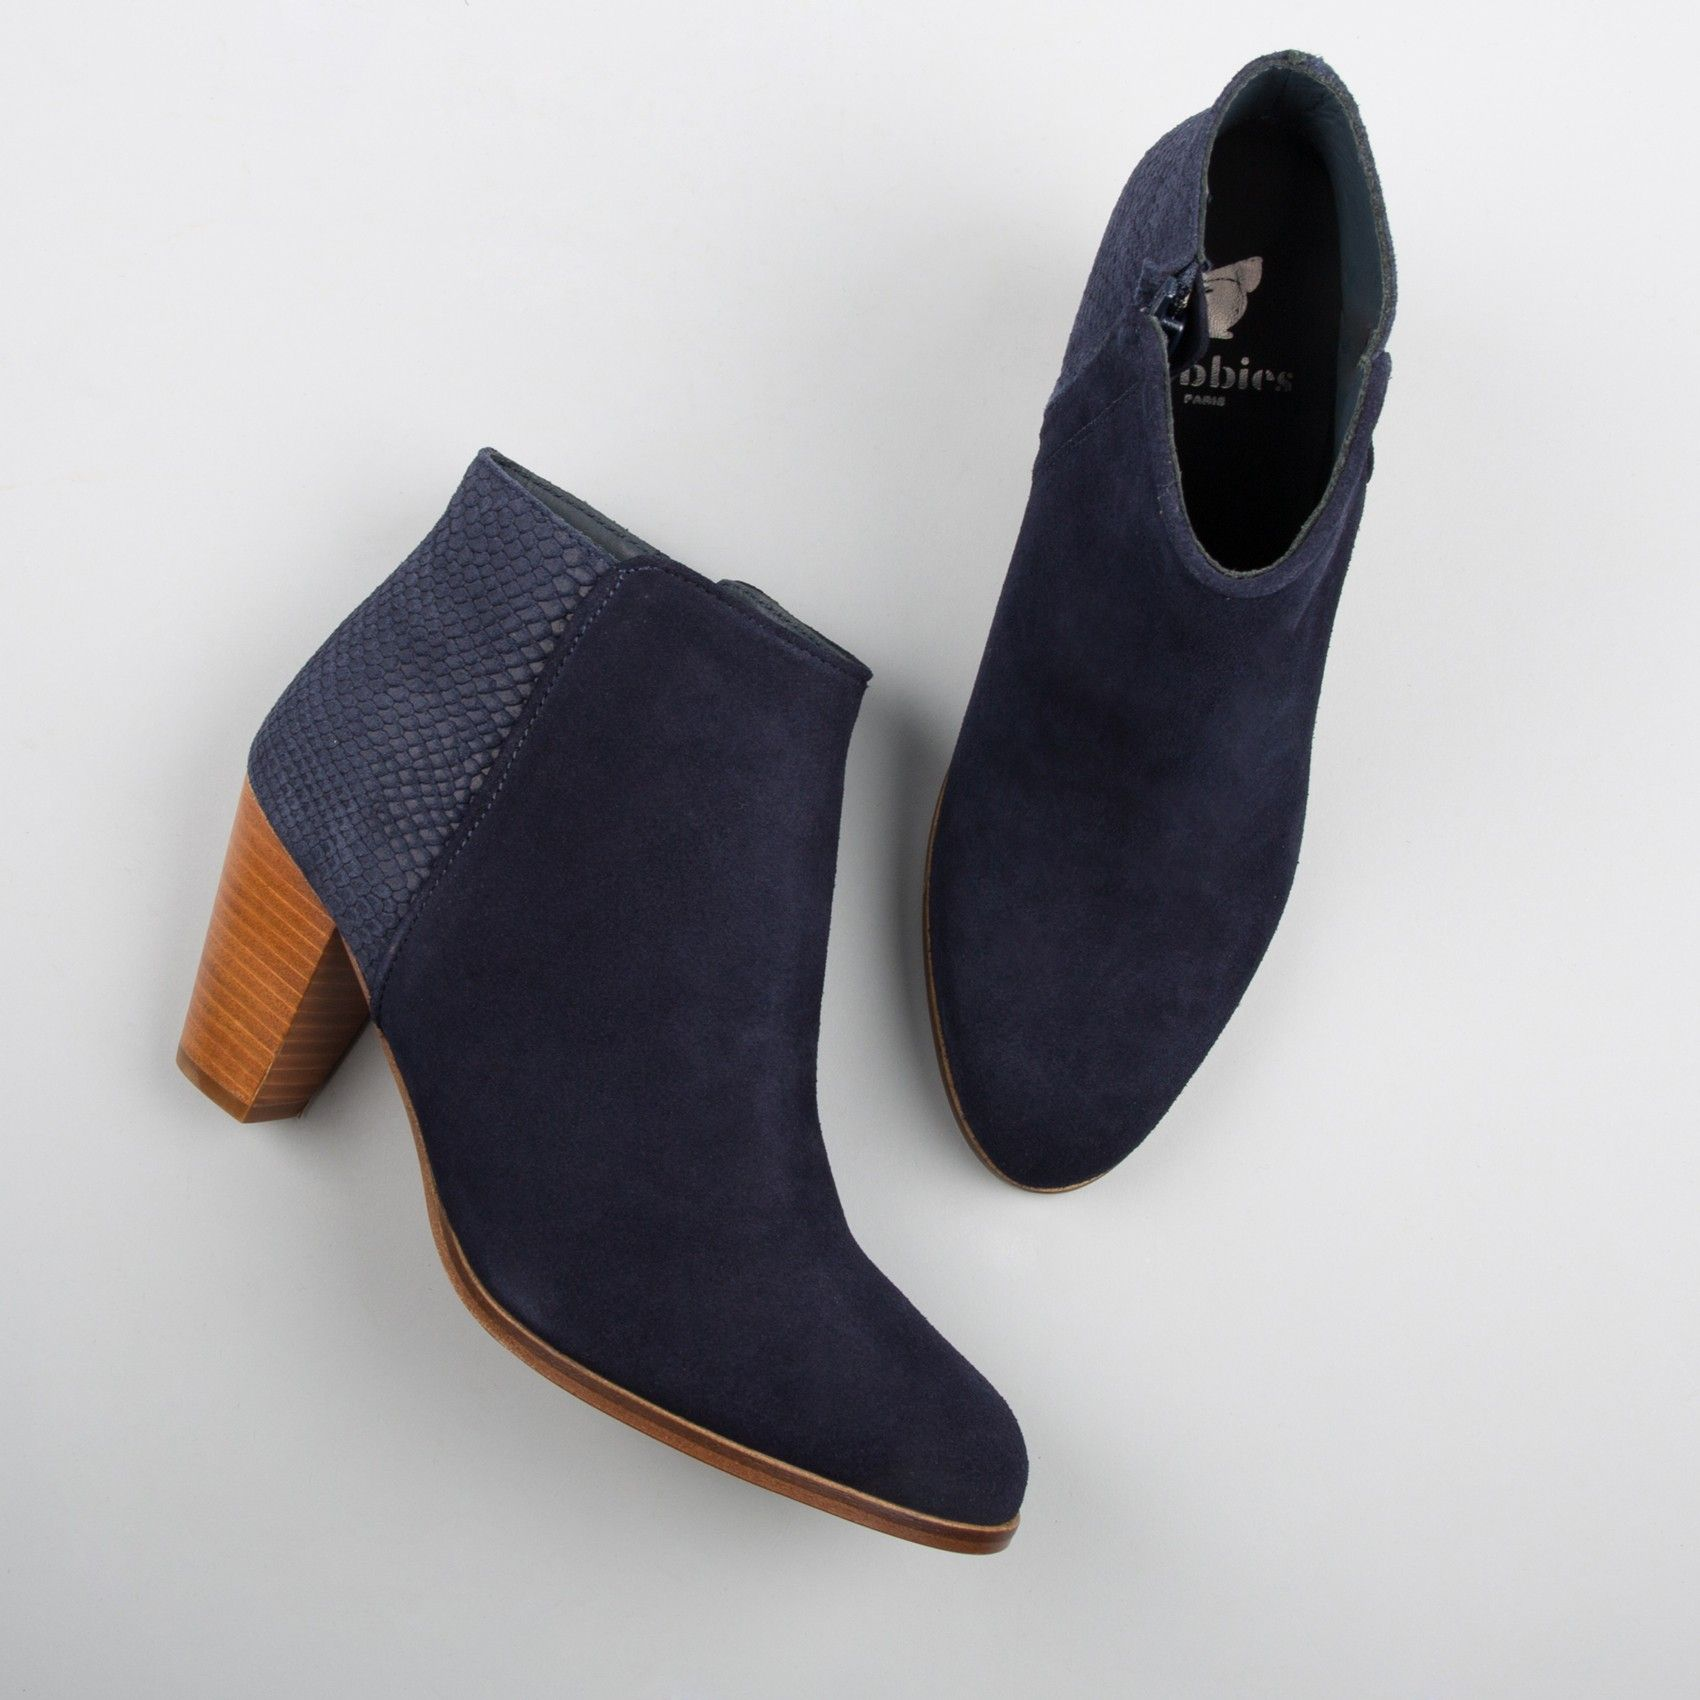 bottines à talons bleu marine - l'envoutante - bobbies | ll i want